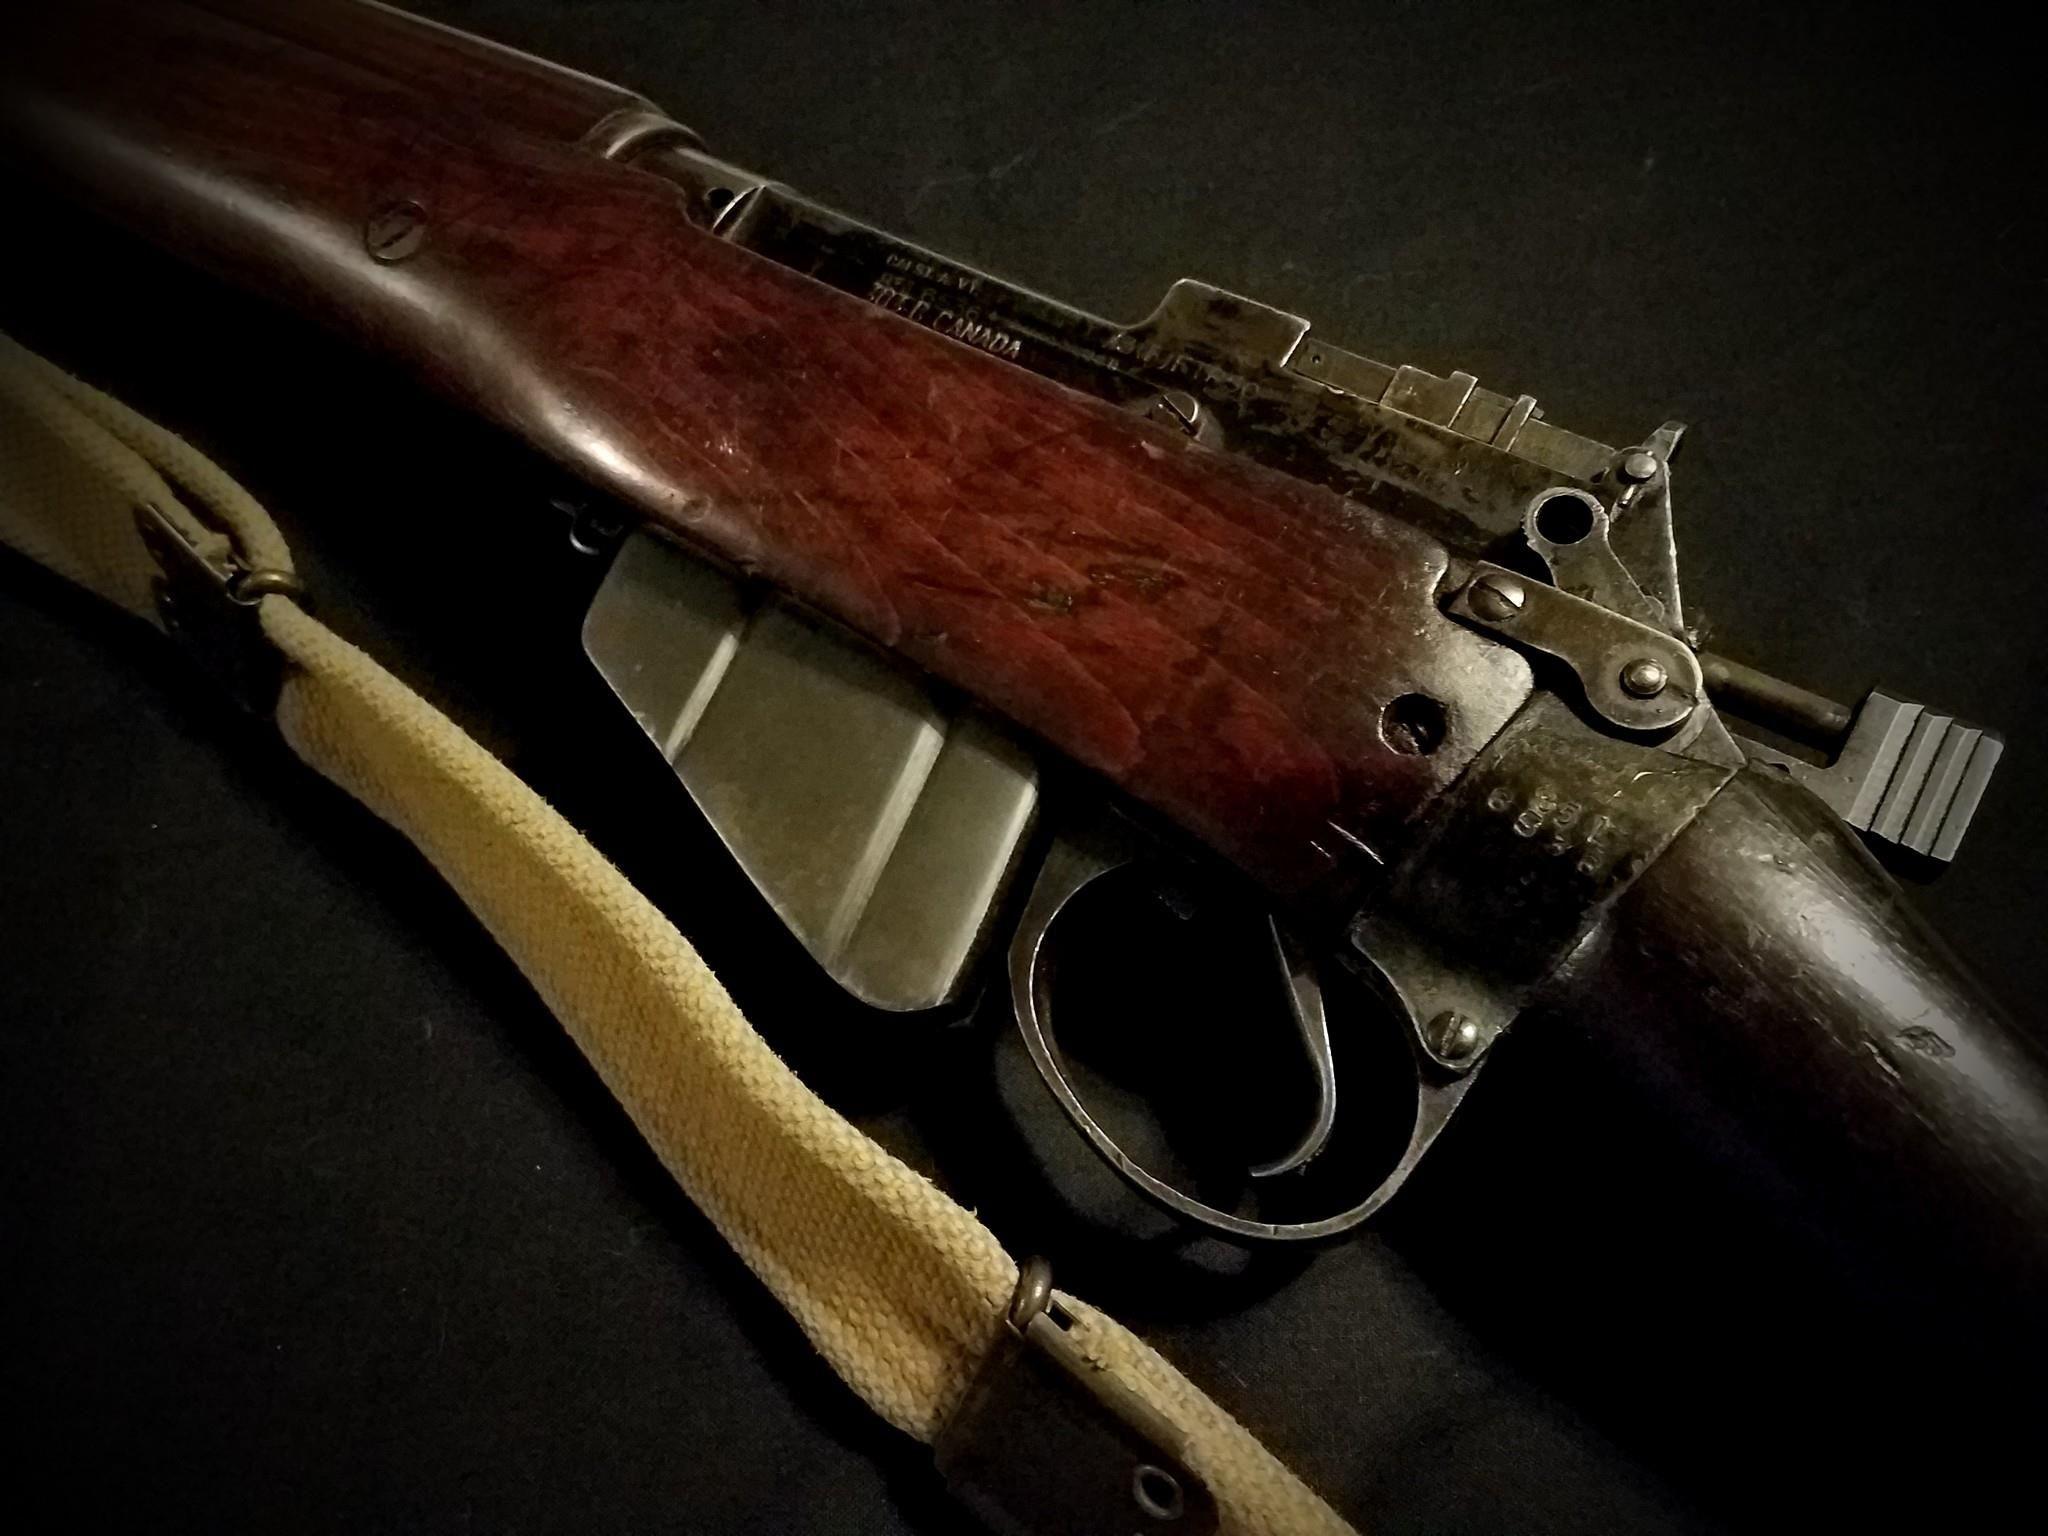 S&W Lady Smith 60-14 357mag Revolver